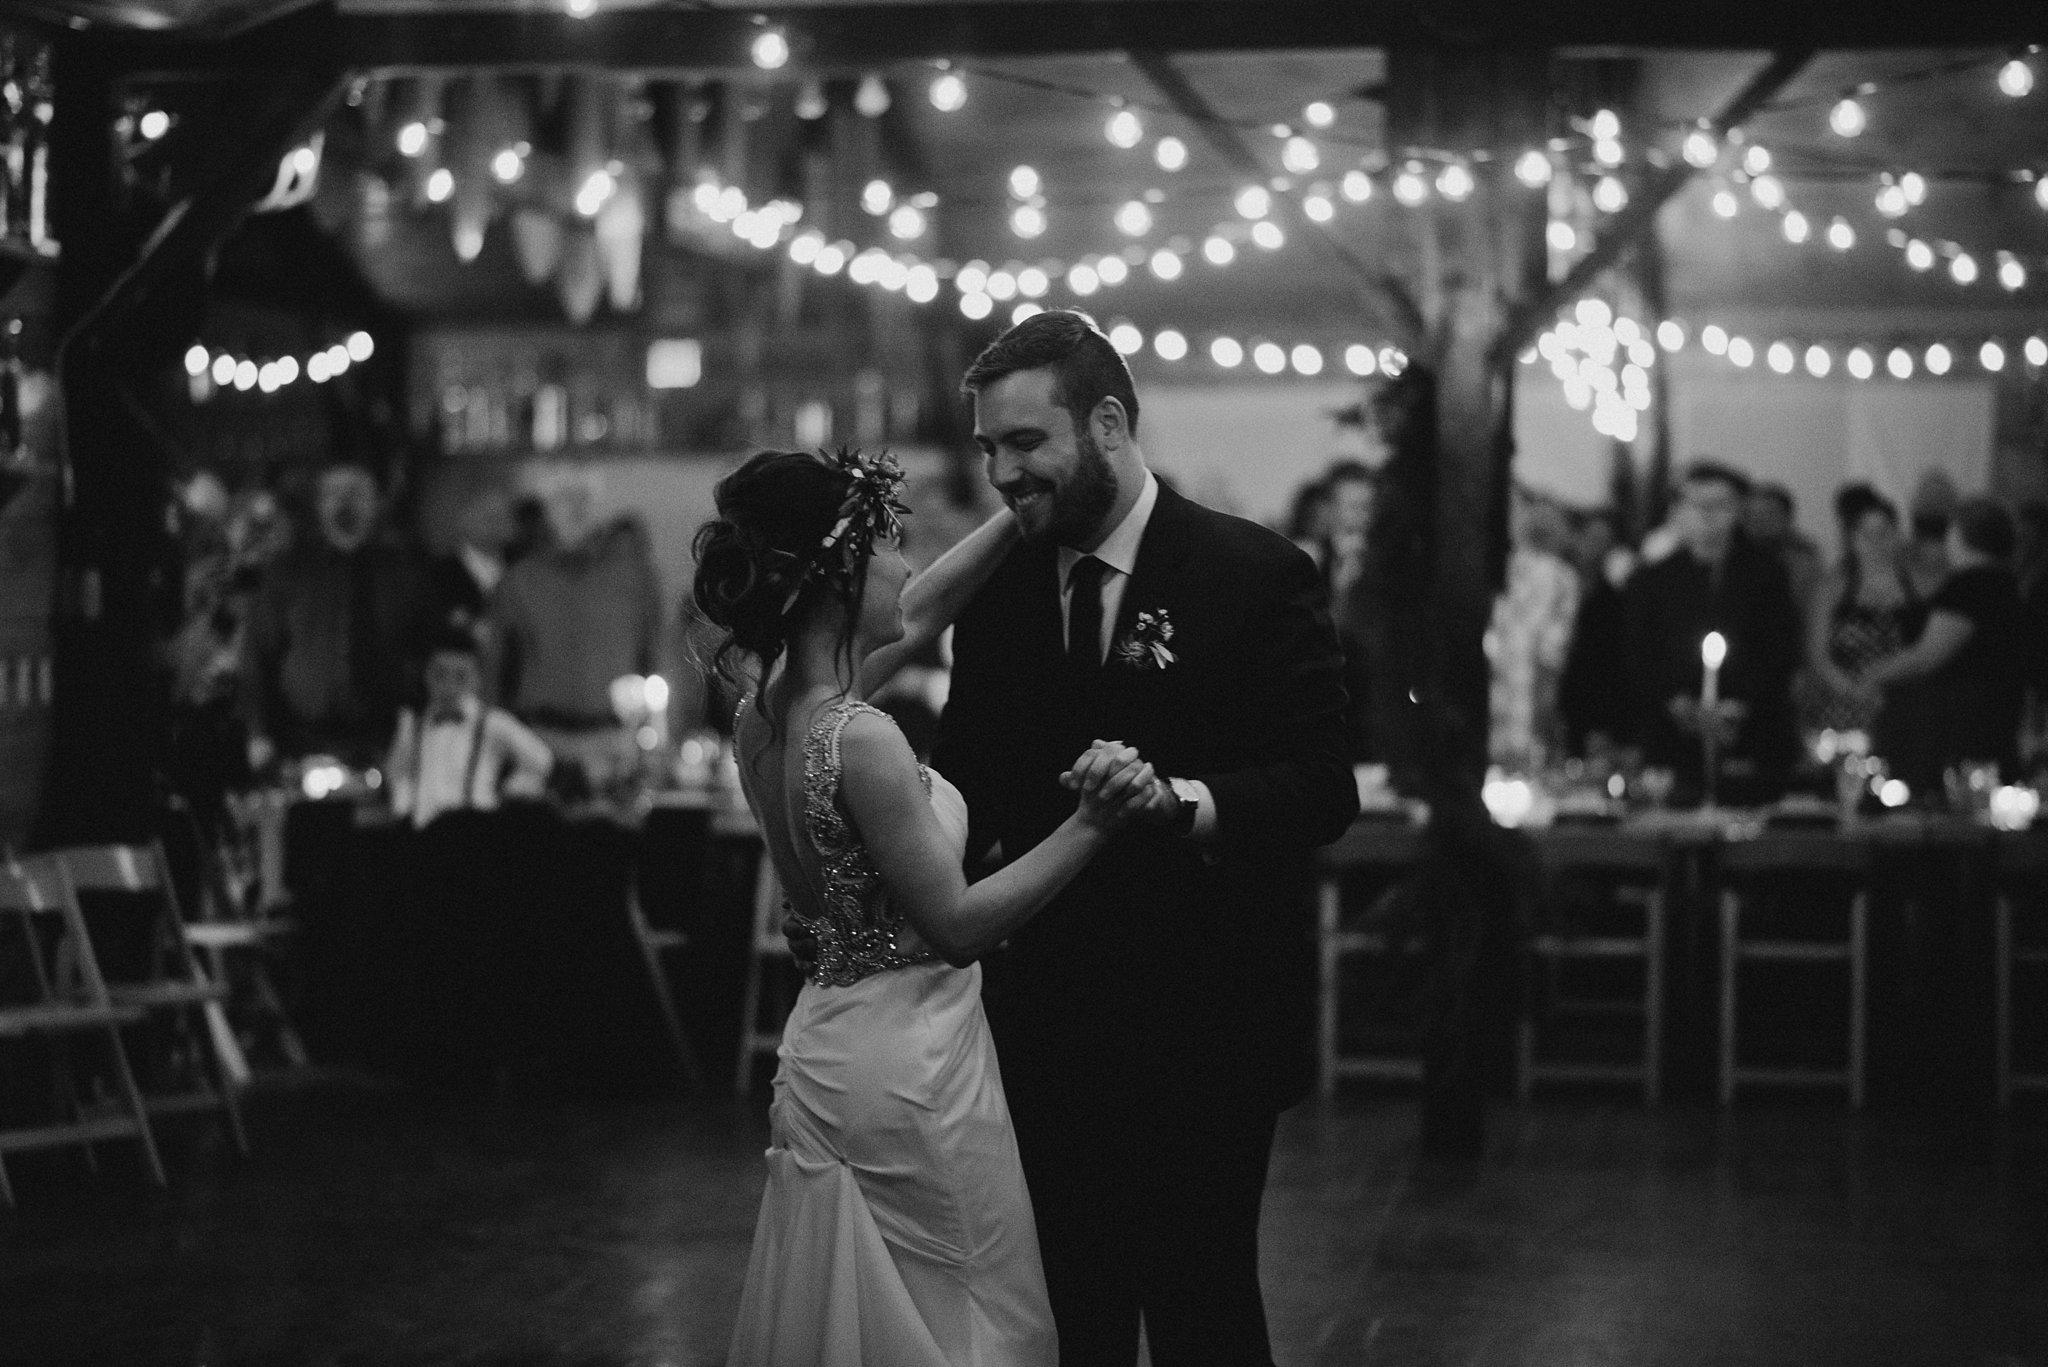 kaihla_tonai_intimate_wedding_elopement_photographer_6670.jpg